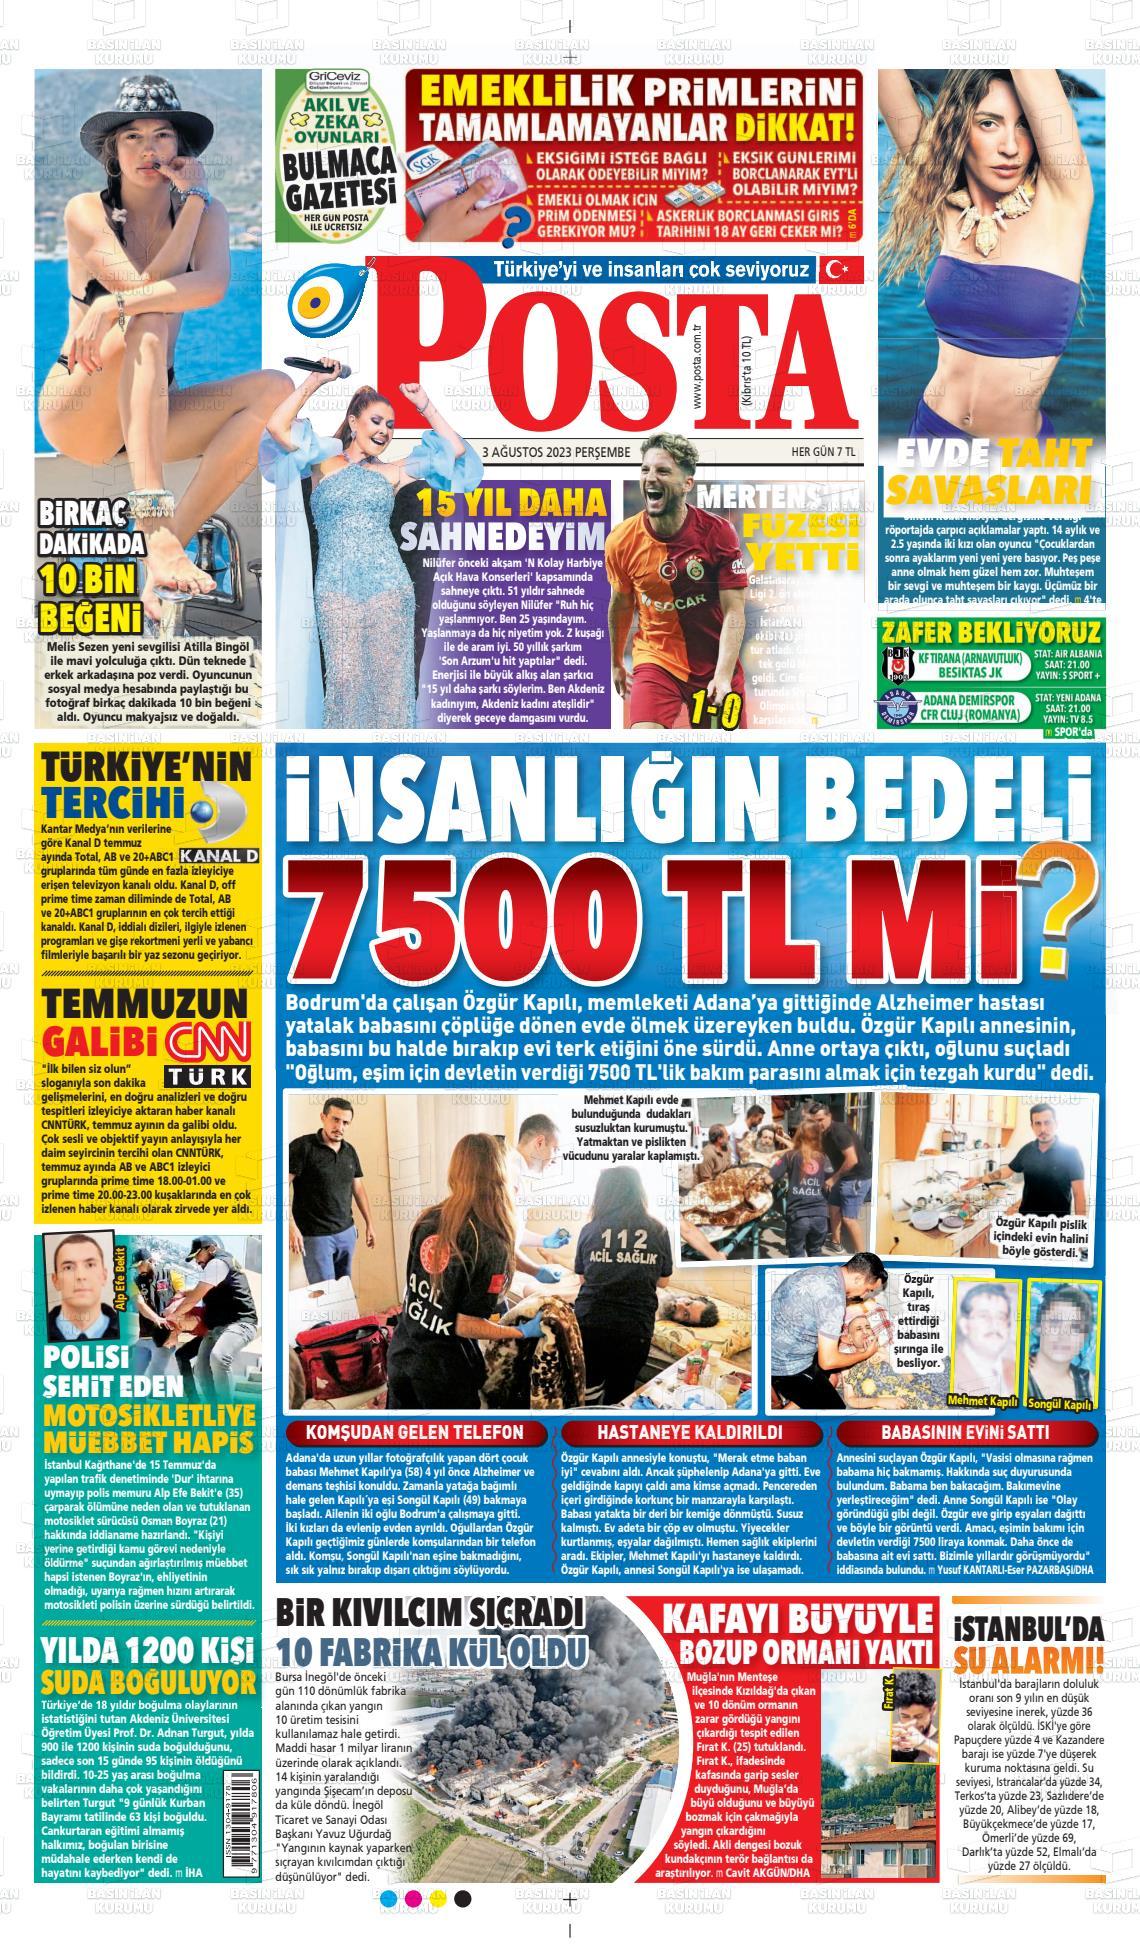 17 Ekim 2019, Perşembe posta Gazetesi